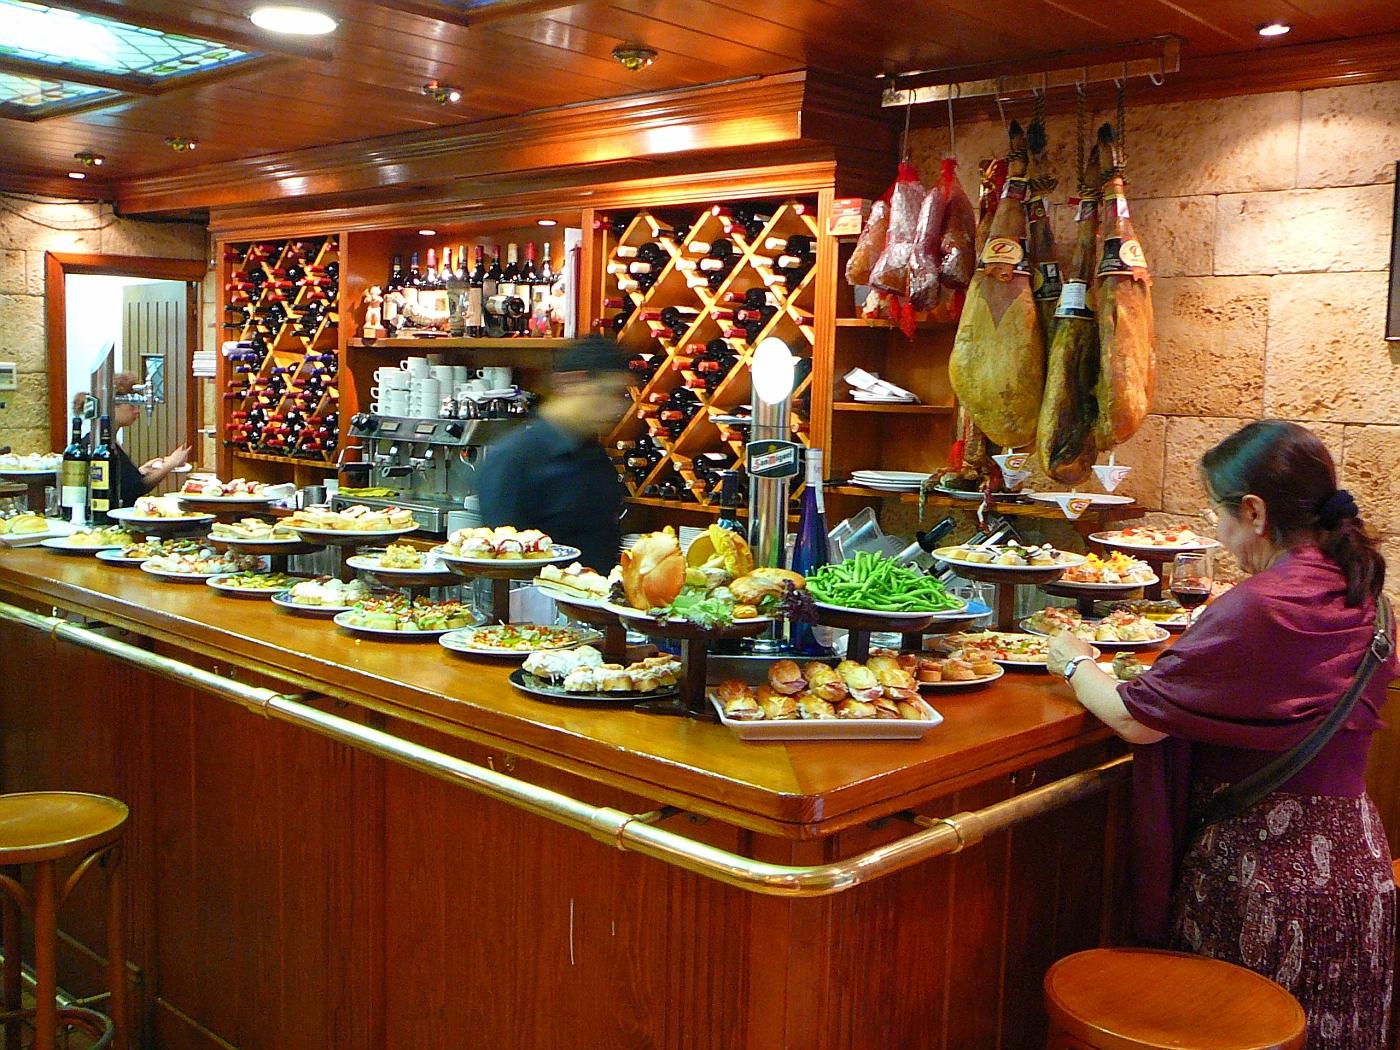 Tapas in San Sabastian - Typical Pub